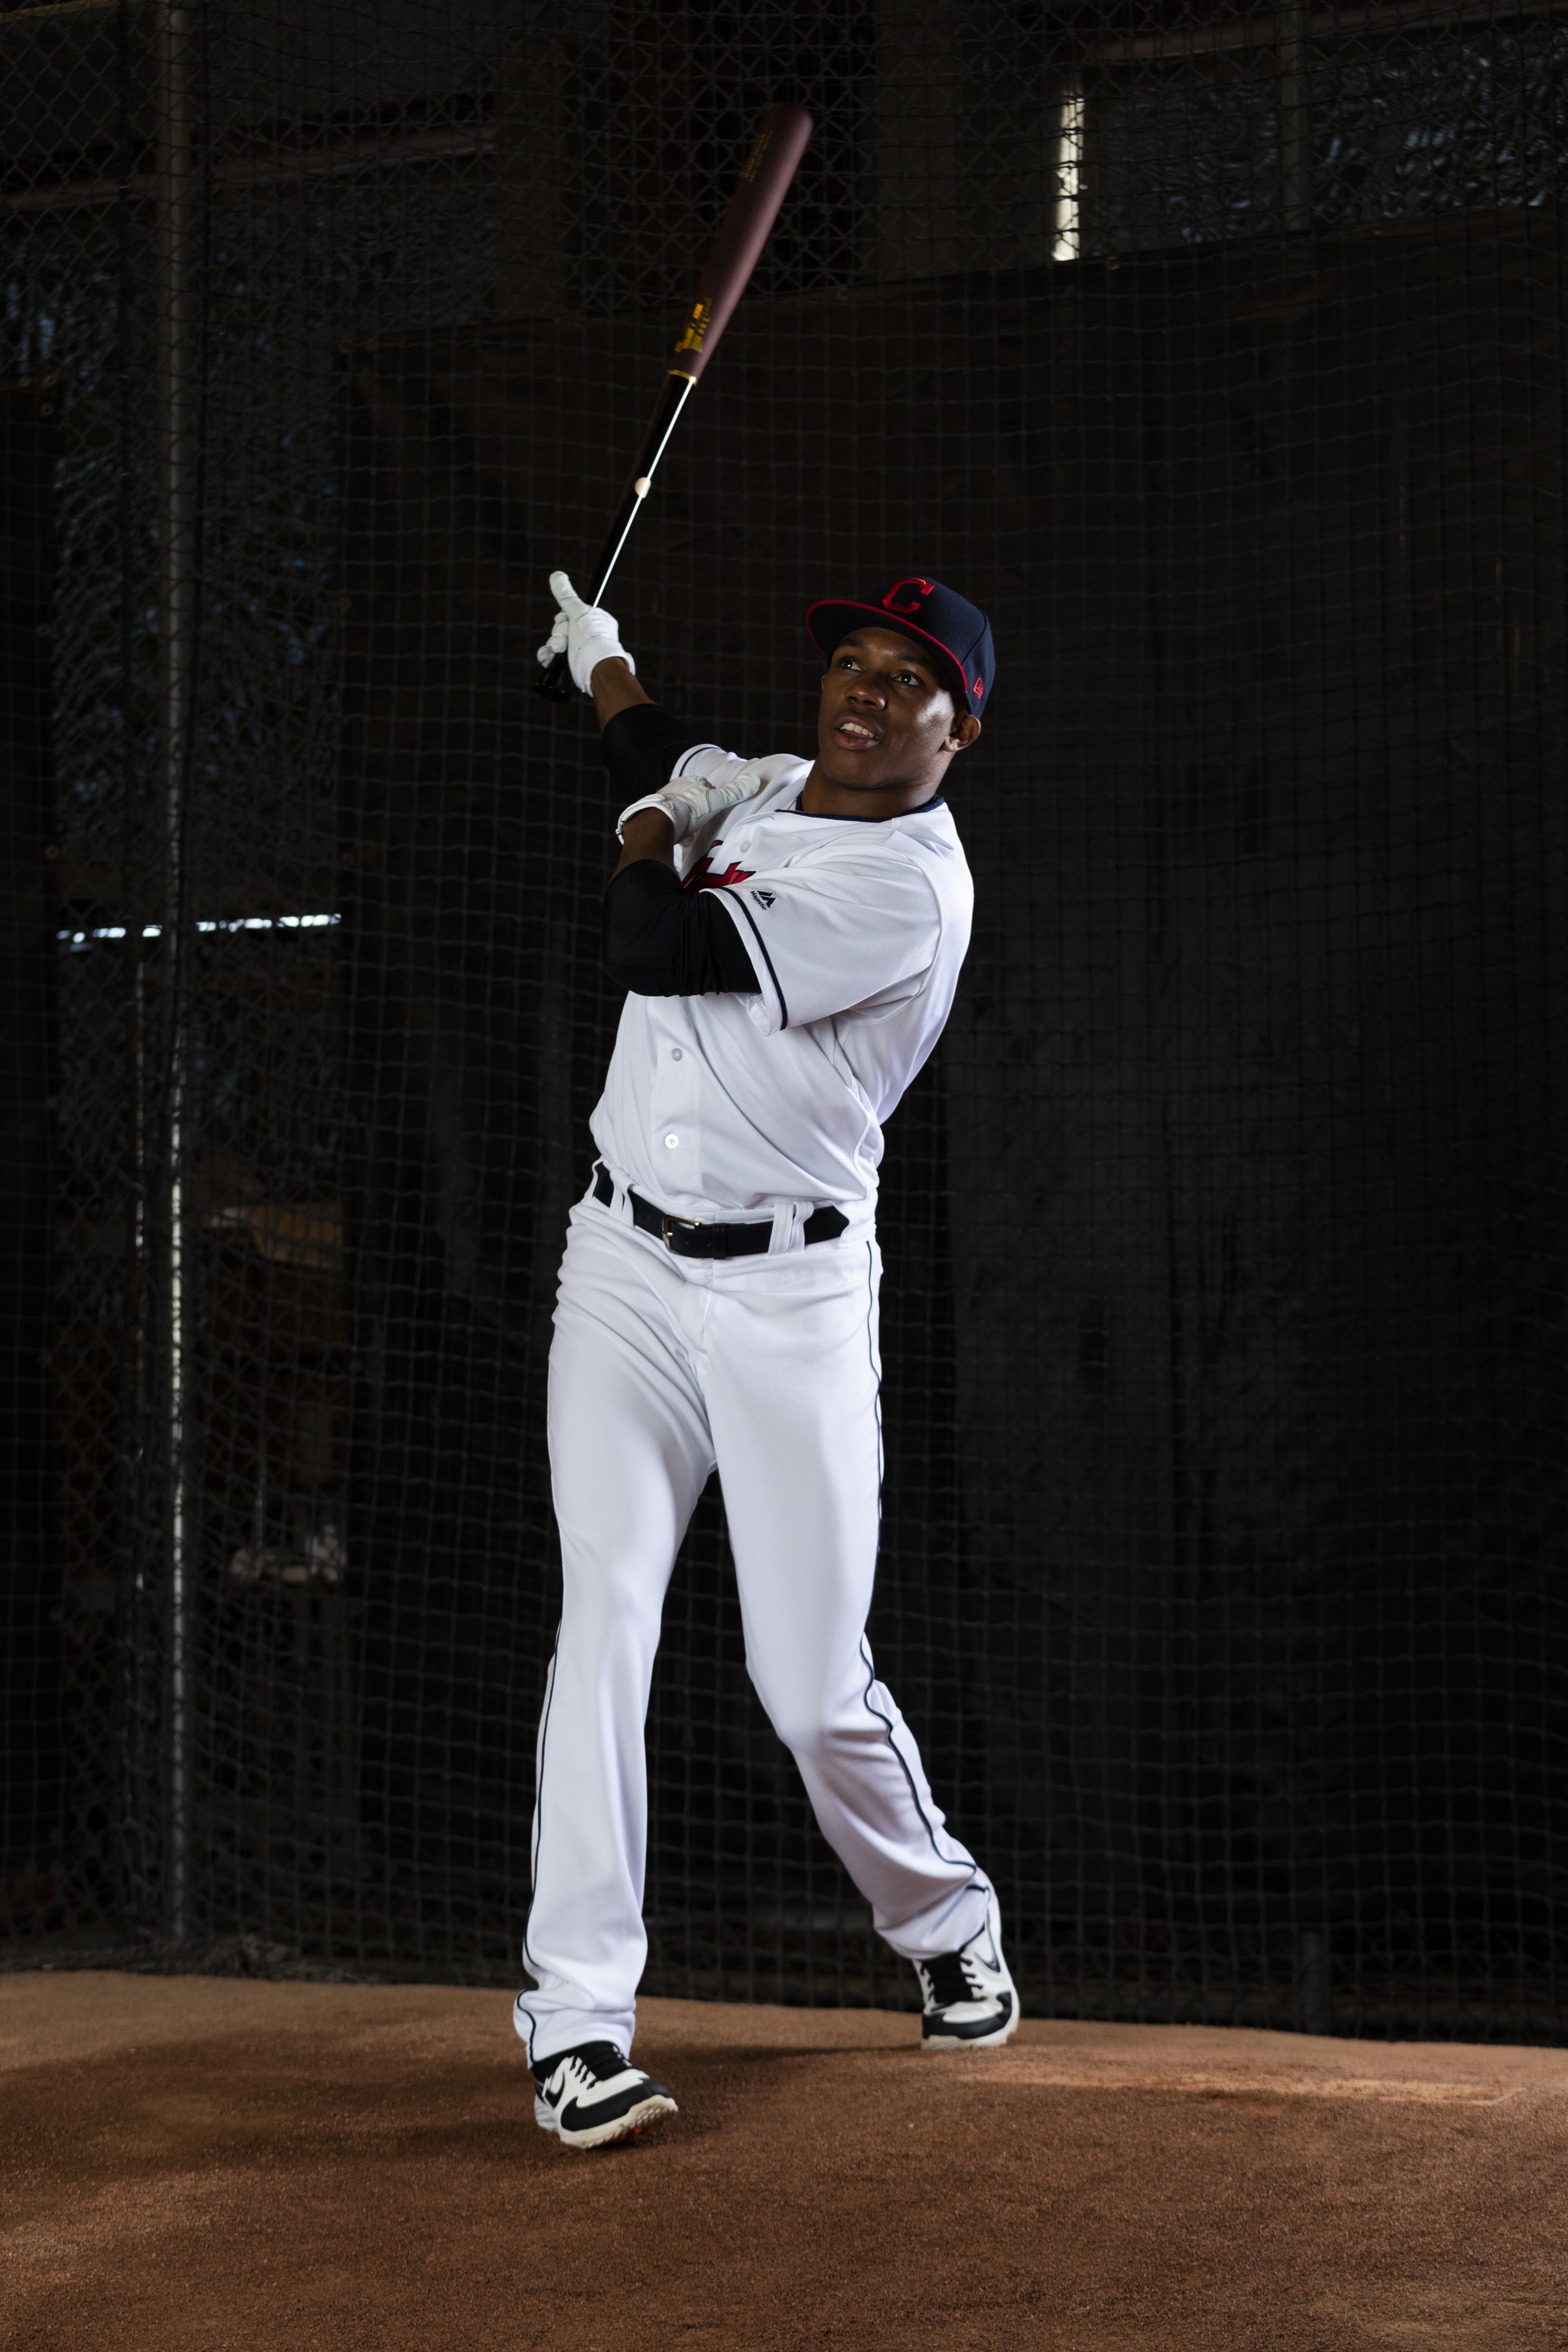 MLB: FEB 19 Cleveland Indians Photo Day